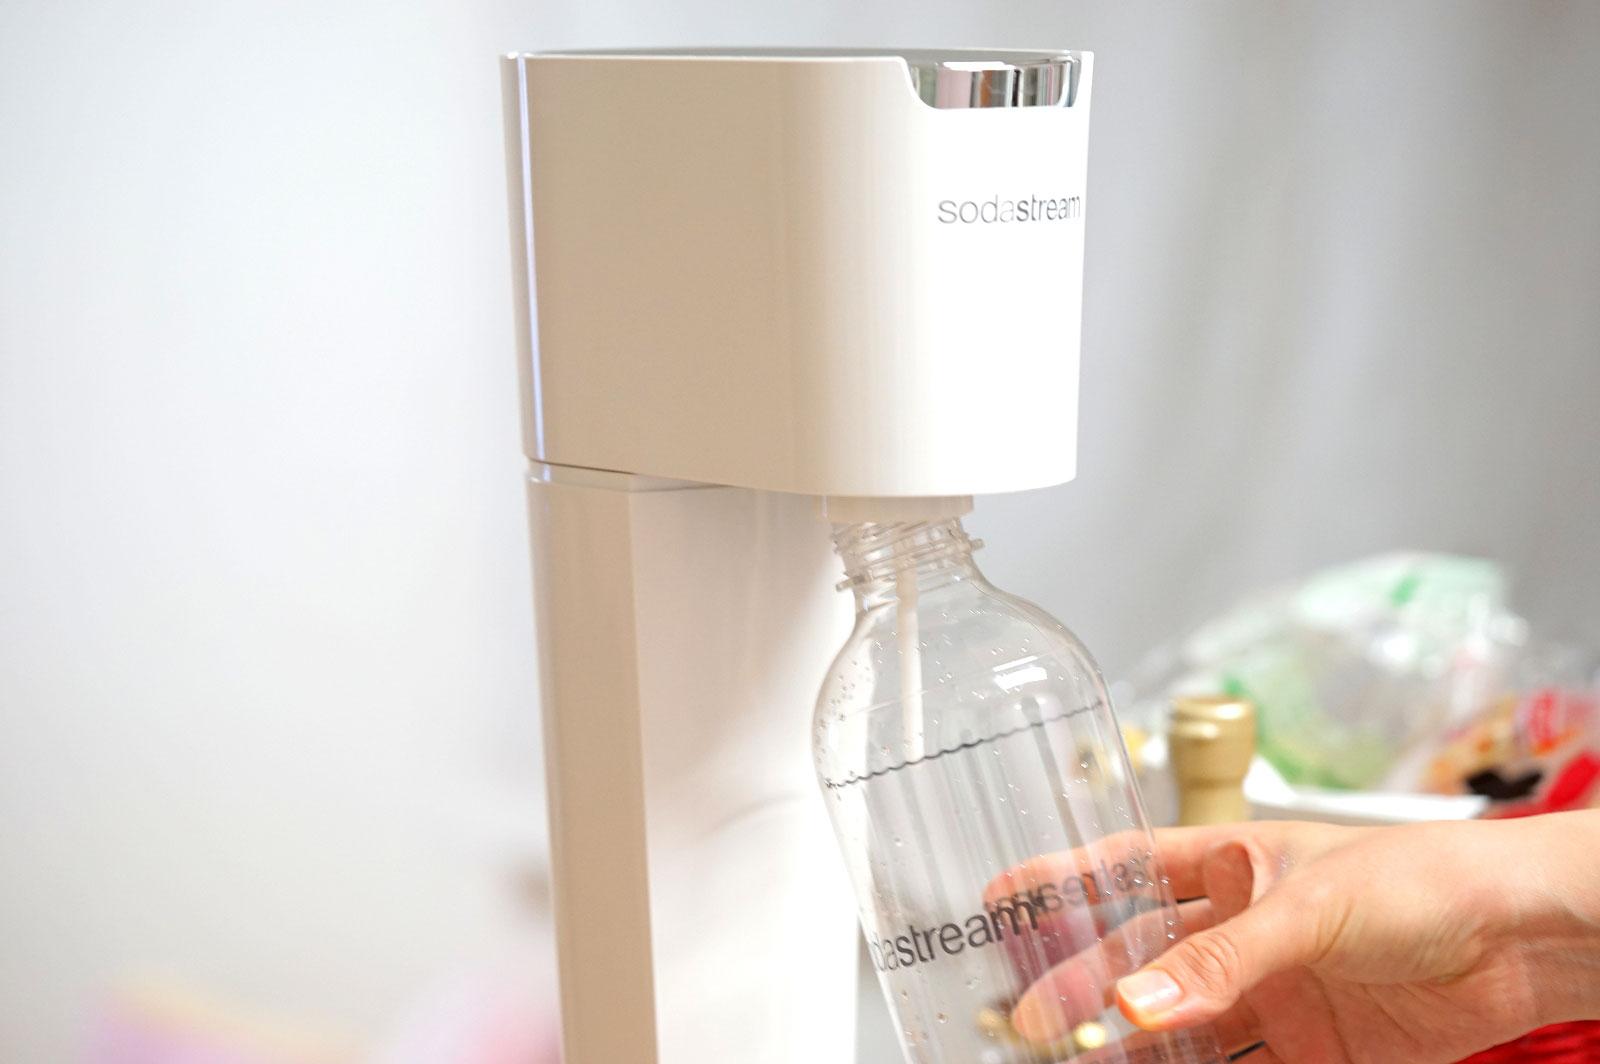 sodaStreamソーダストリームで炭酸水を作ってみた